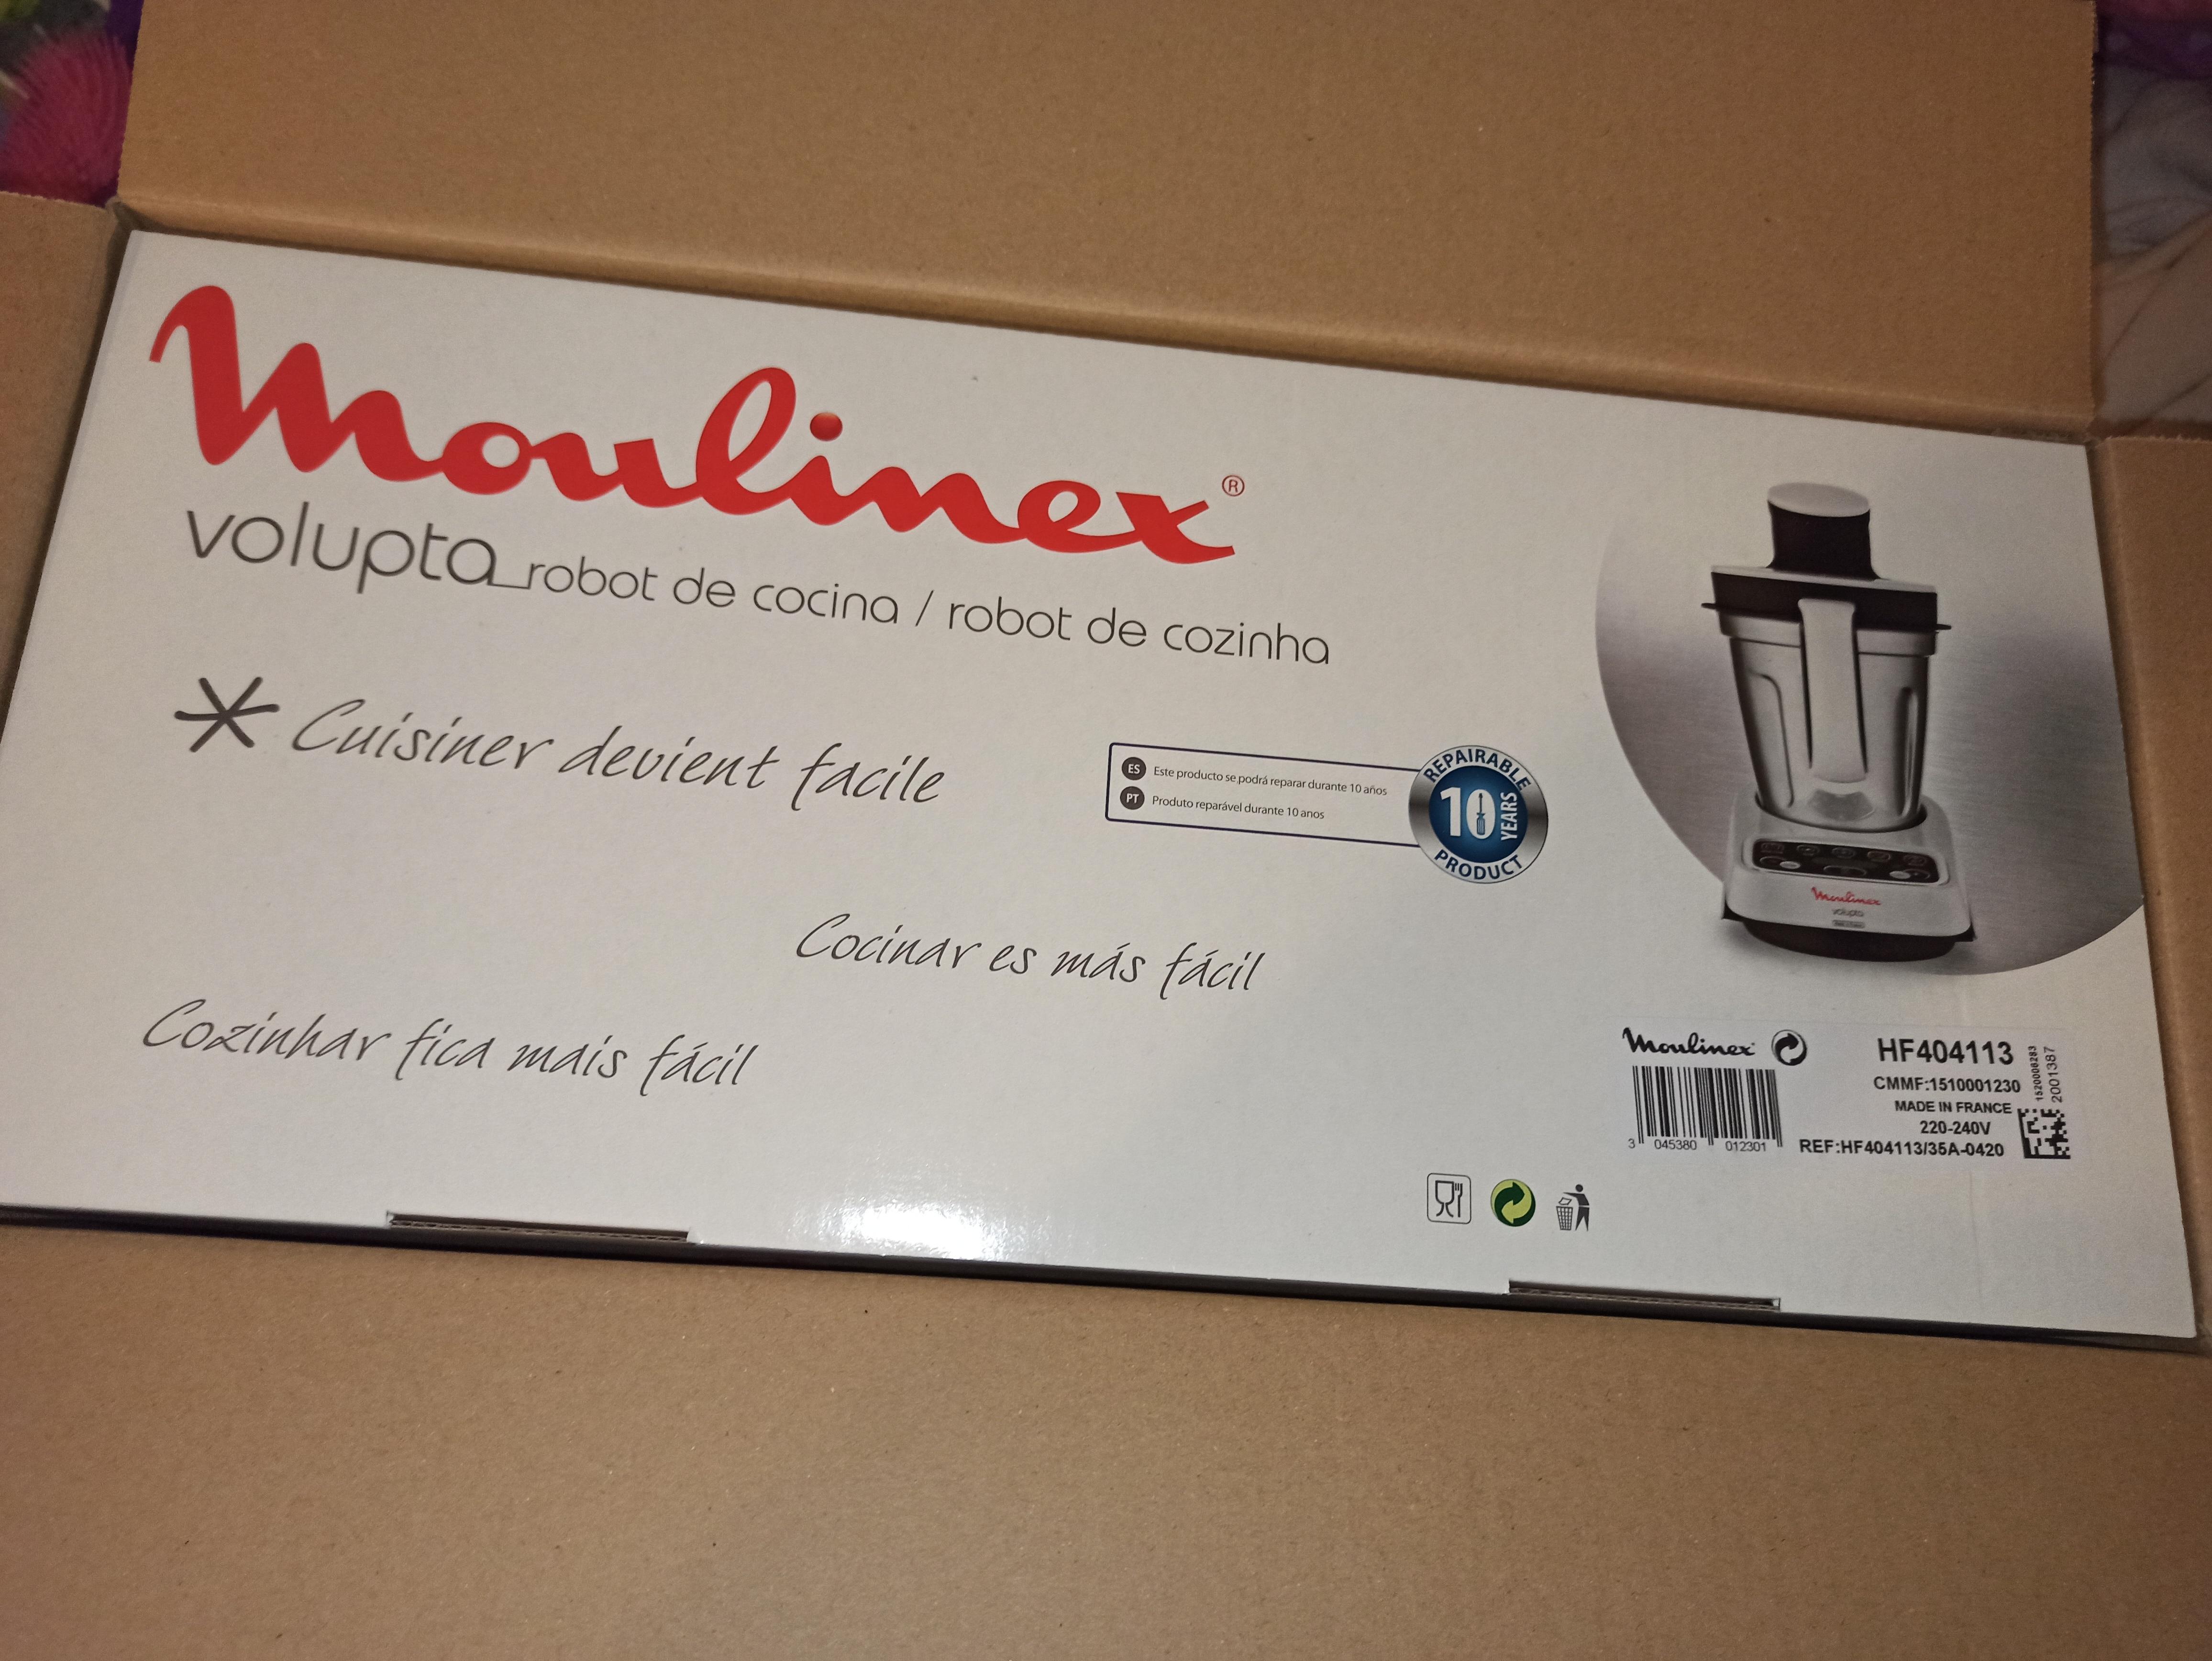 Moulinex - Robot de Cocina Volupta 1000W